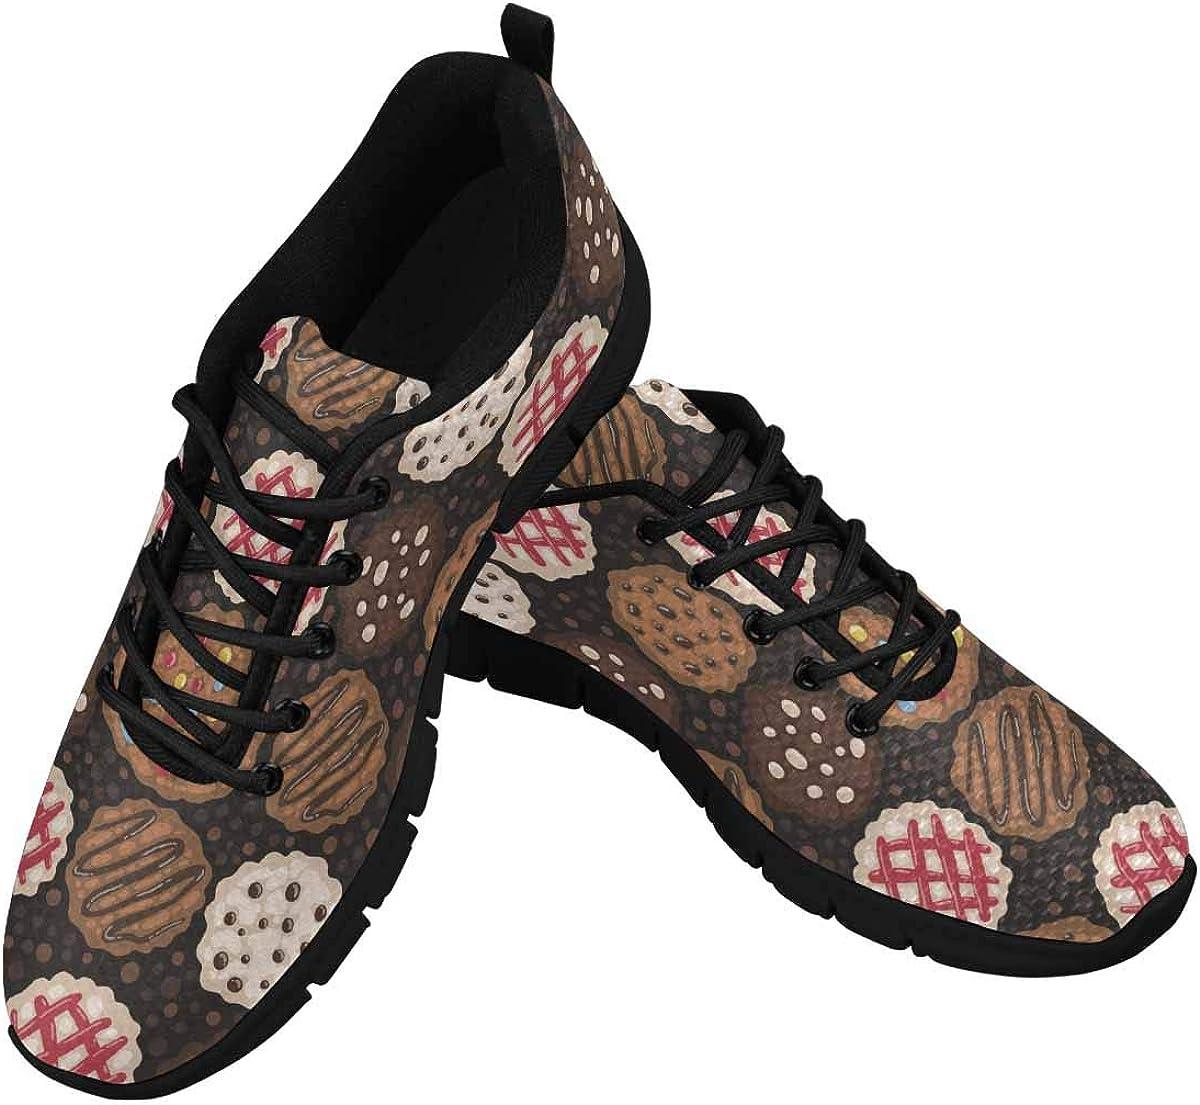 InterestPrint Cookies Pattern Women's Athletic Mesh Breathable Casual Sneakers